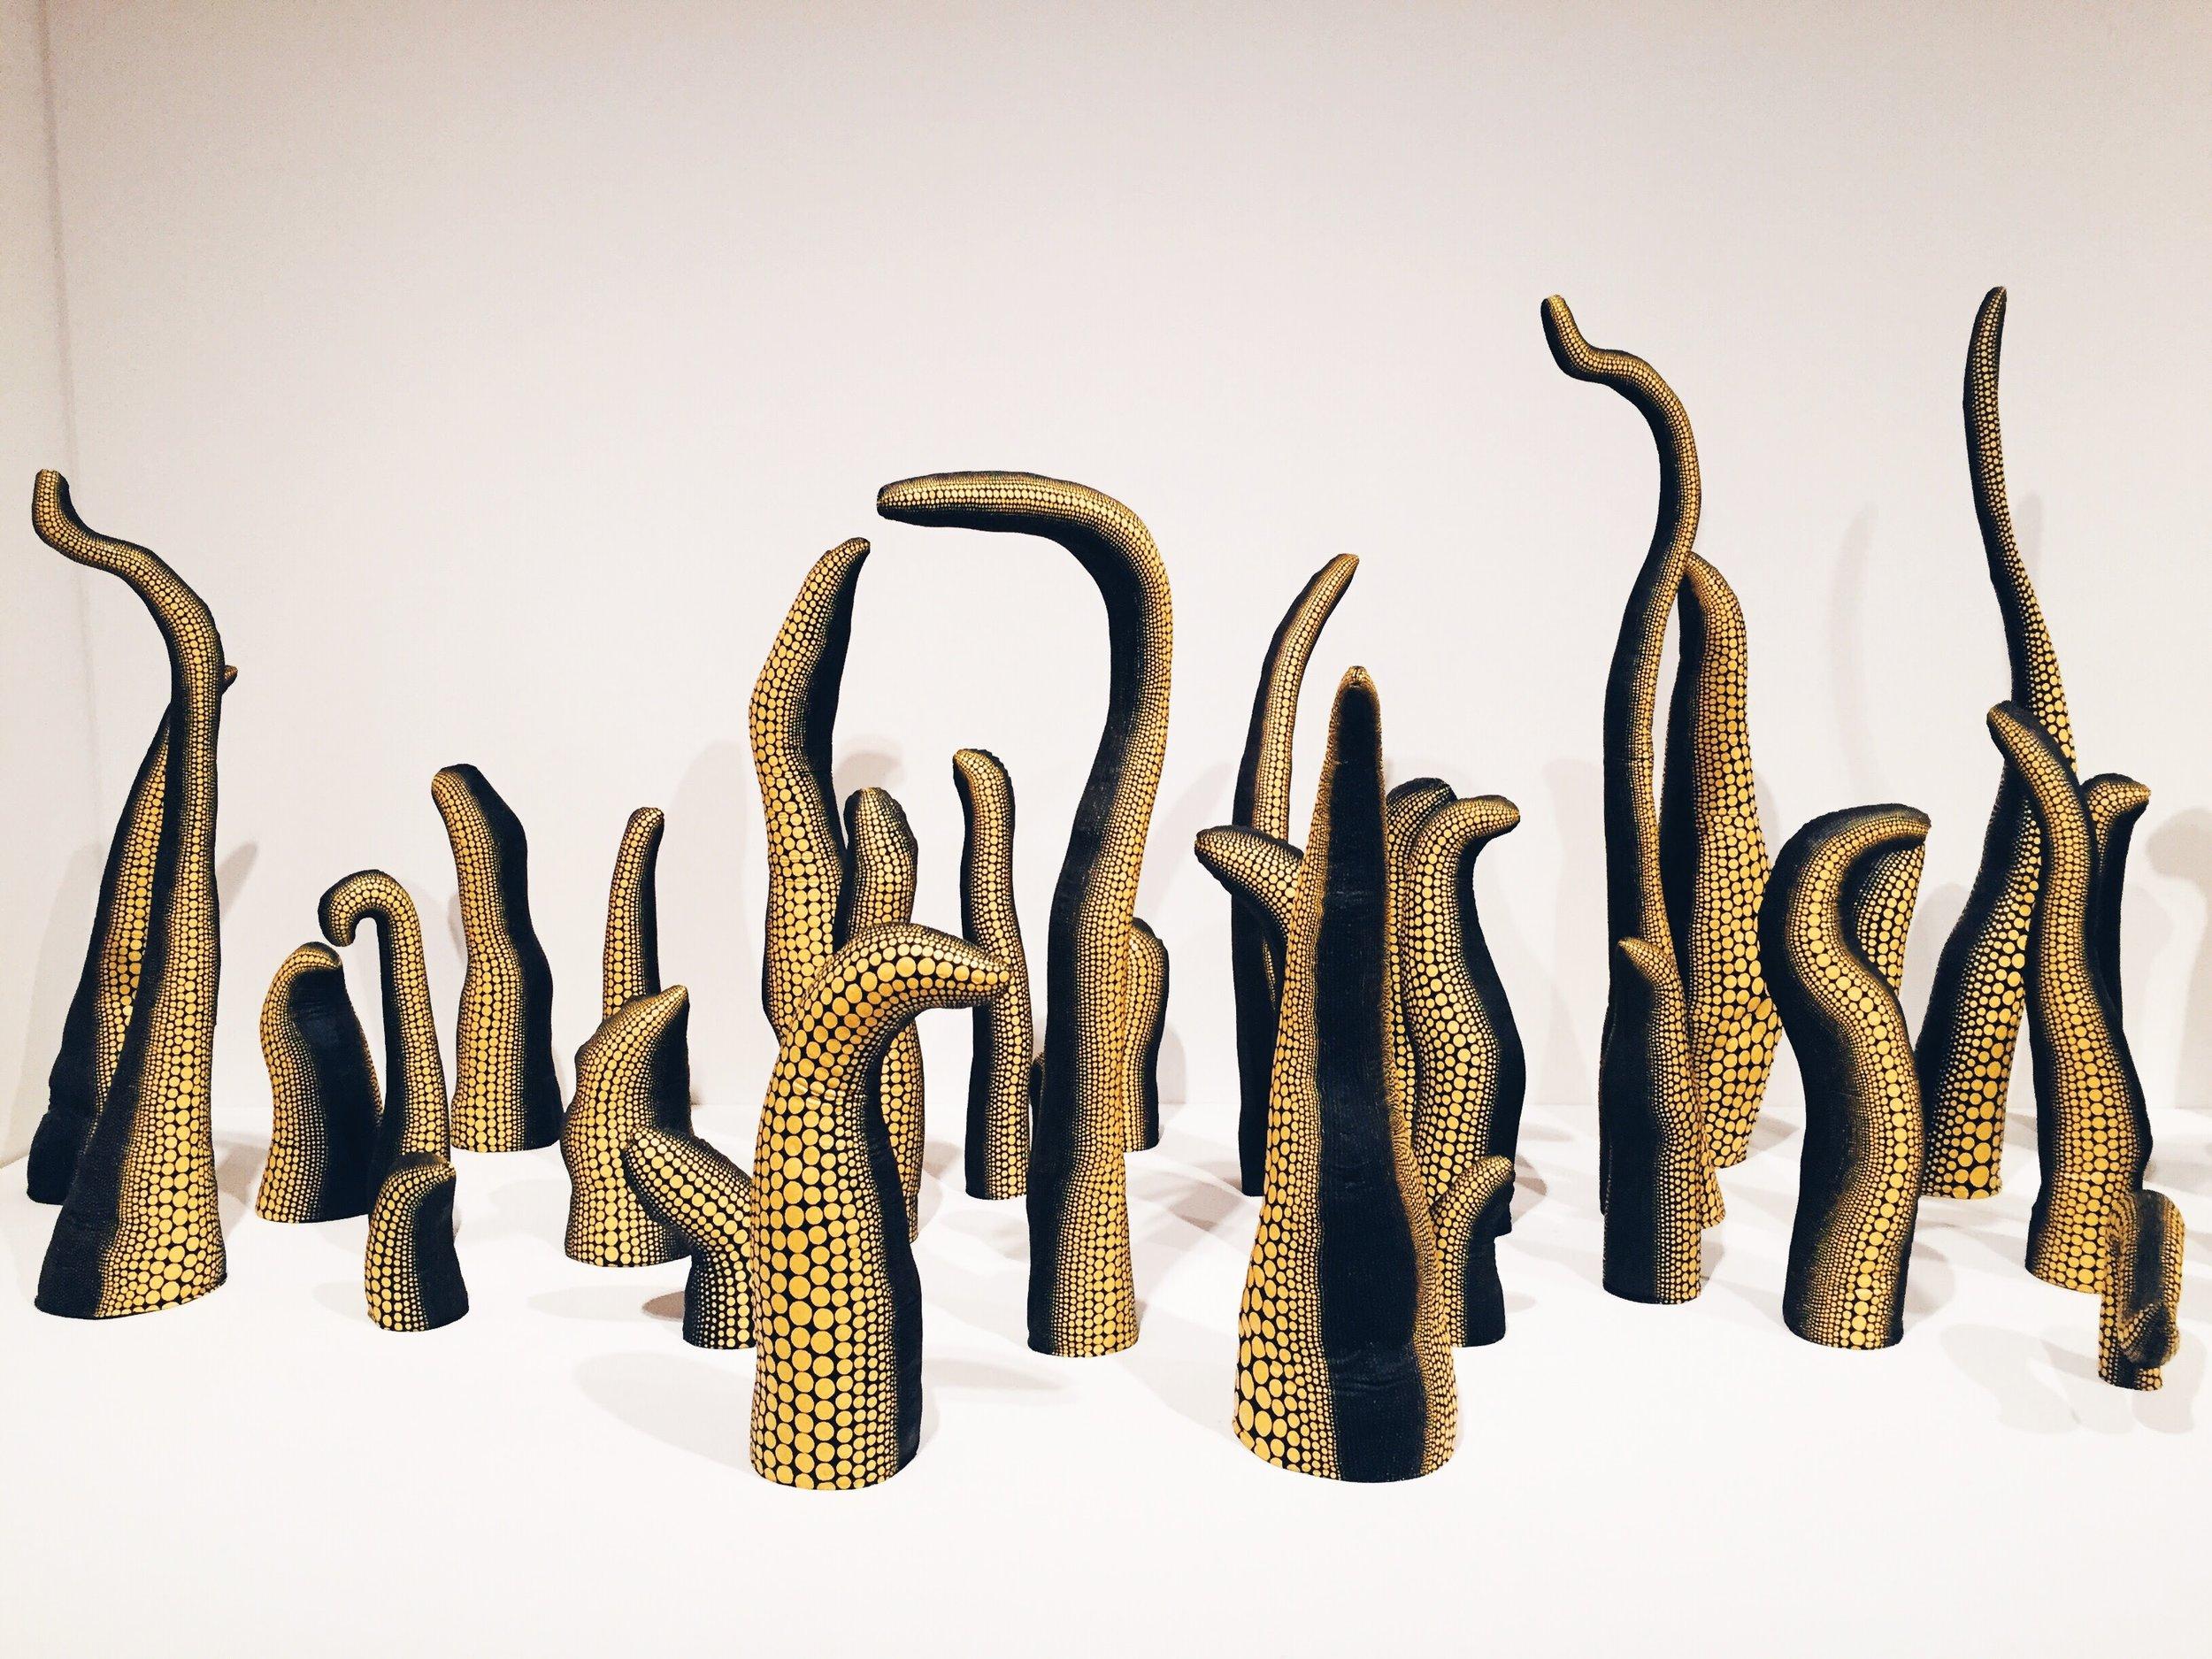 Yayoi Kusama,  Life (Repetitive Vision) (1998)